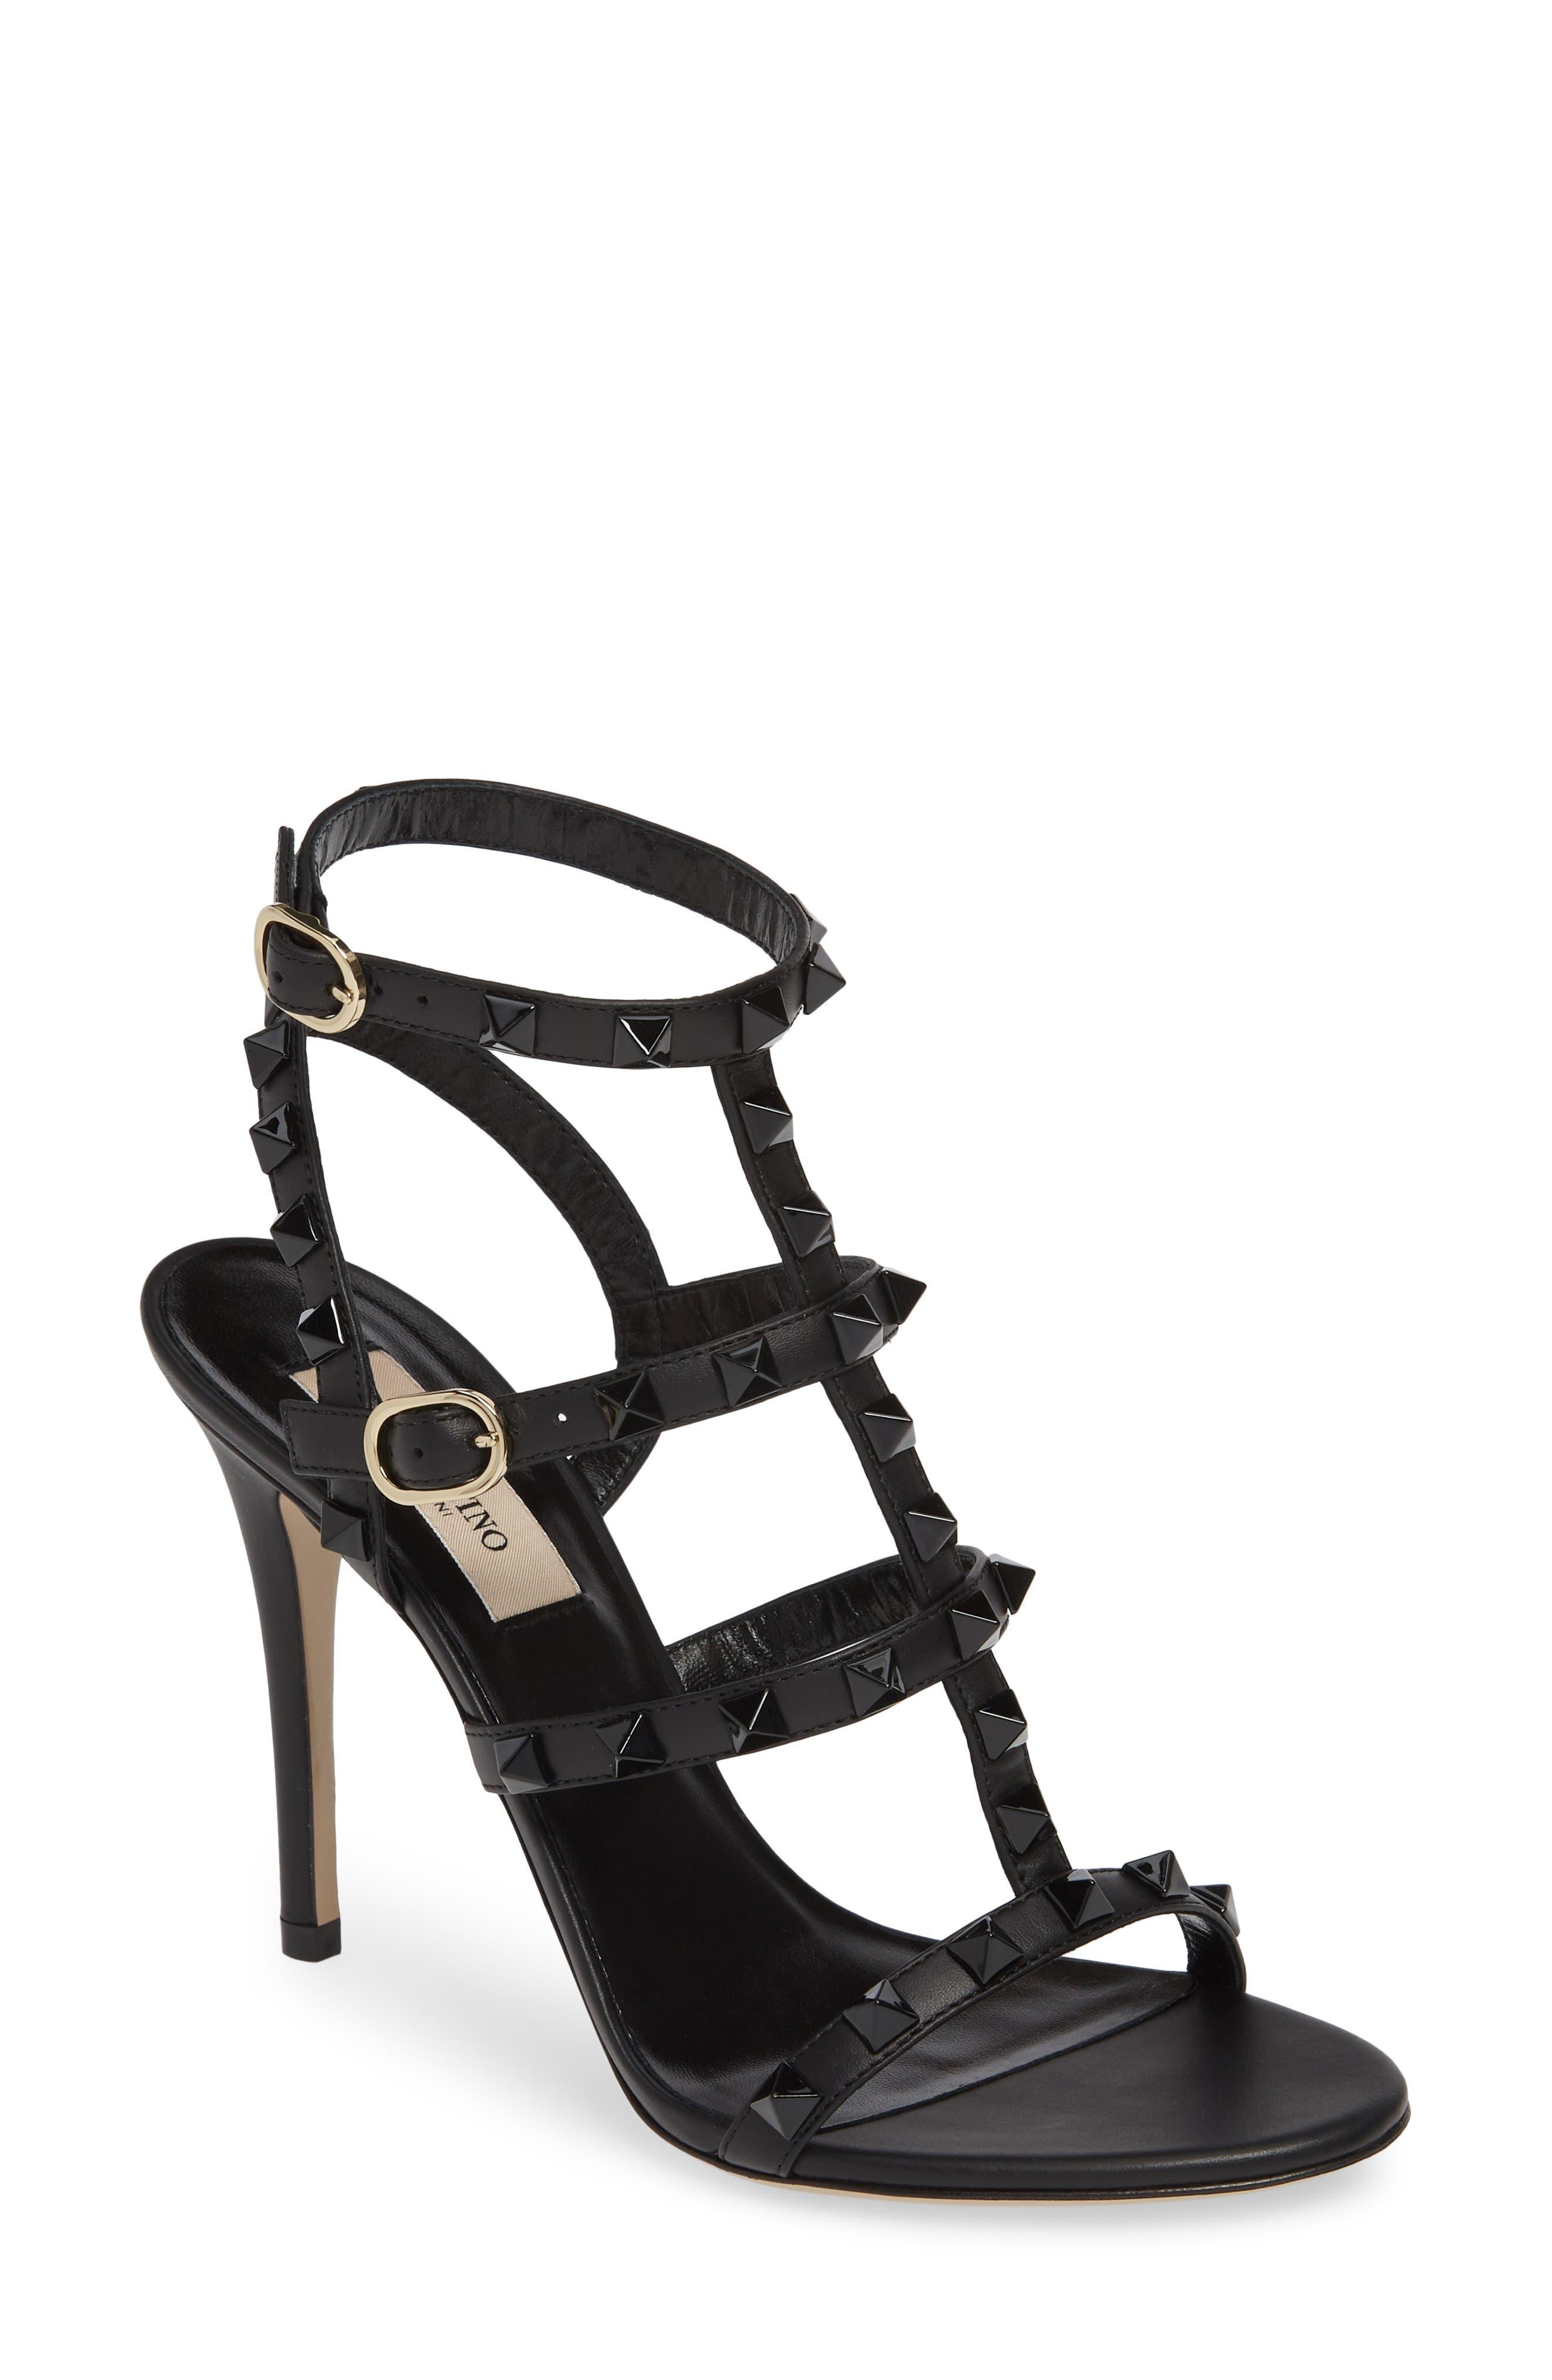 VALENTINO GARAVANI, Rockstud T-Strap Sandal, Main thumbnail 1, color, BLACK